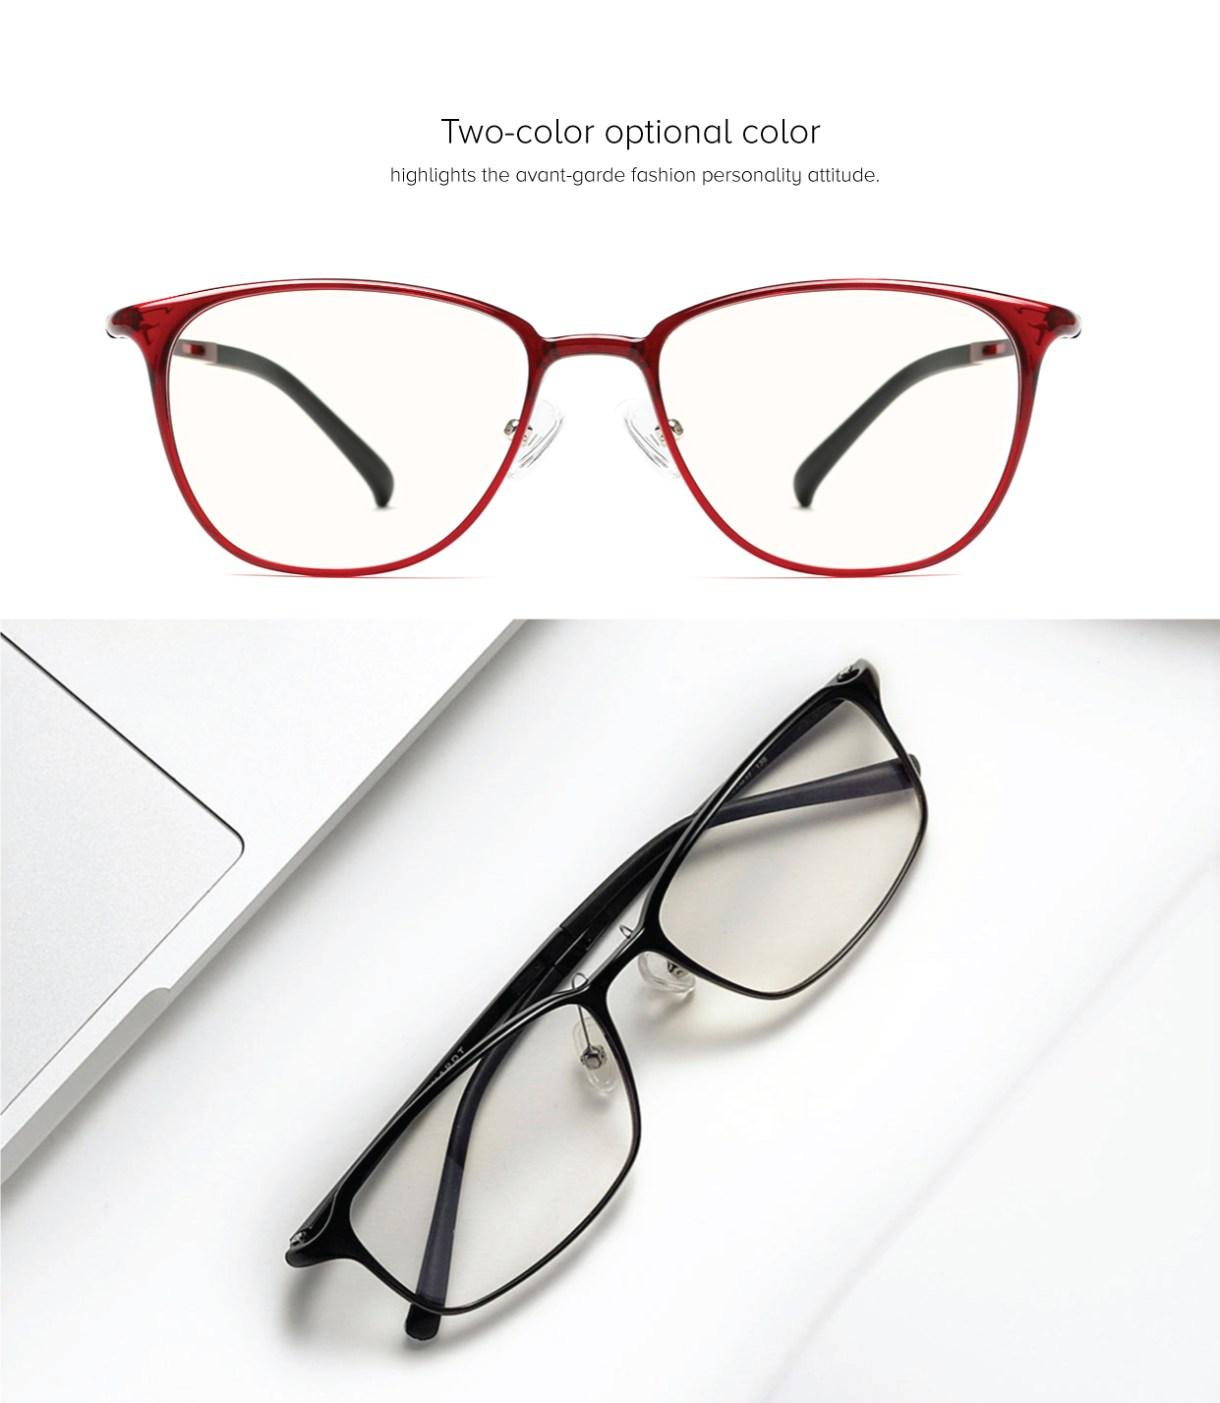 39b766bc347c Xiaomi TS Anti-Blue Ray Computer Glasses - Thevipmi - First Xiaomi ...